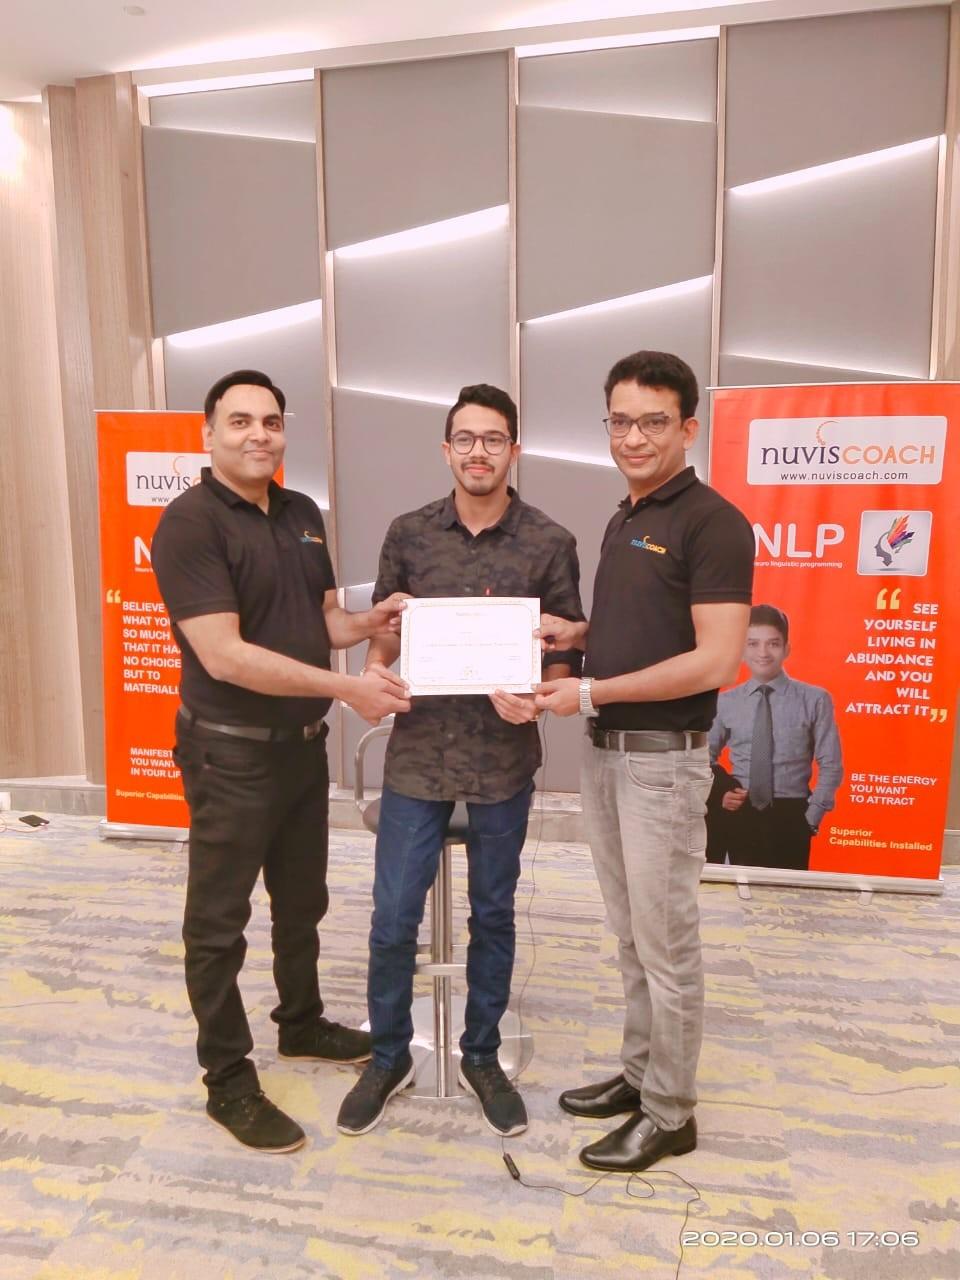 NLP Certification